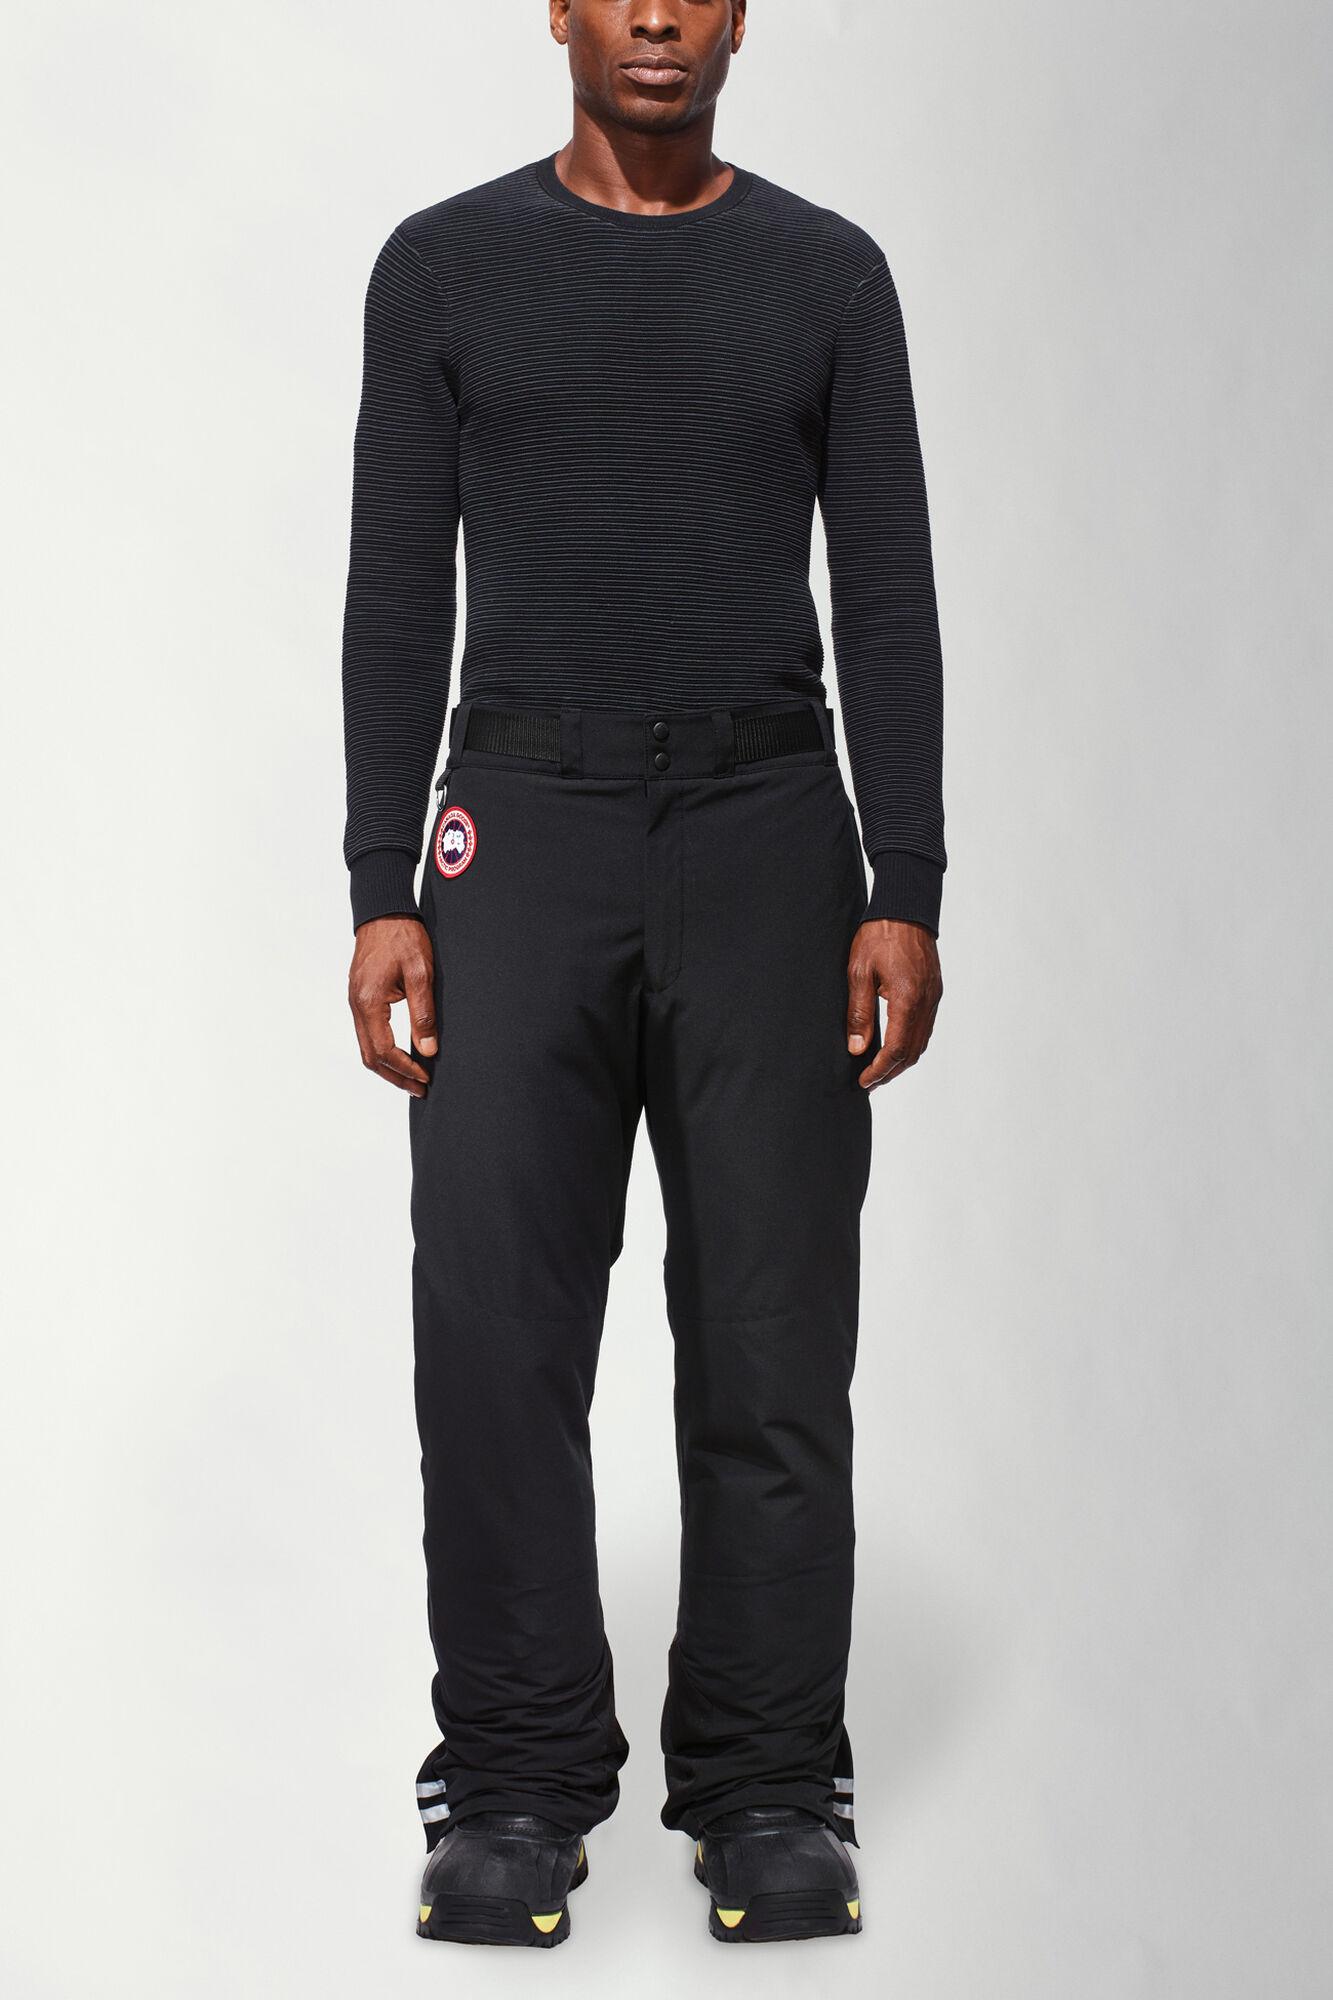 Canada Goose hats online store - Men's Arctic Program Tundra Pant | Canada Goose?